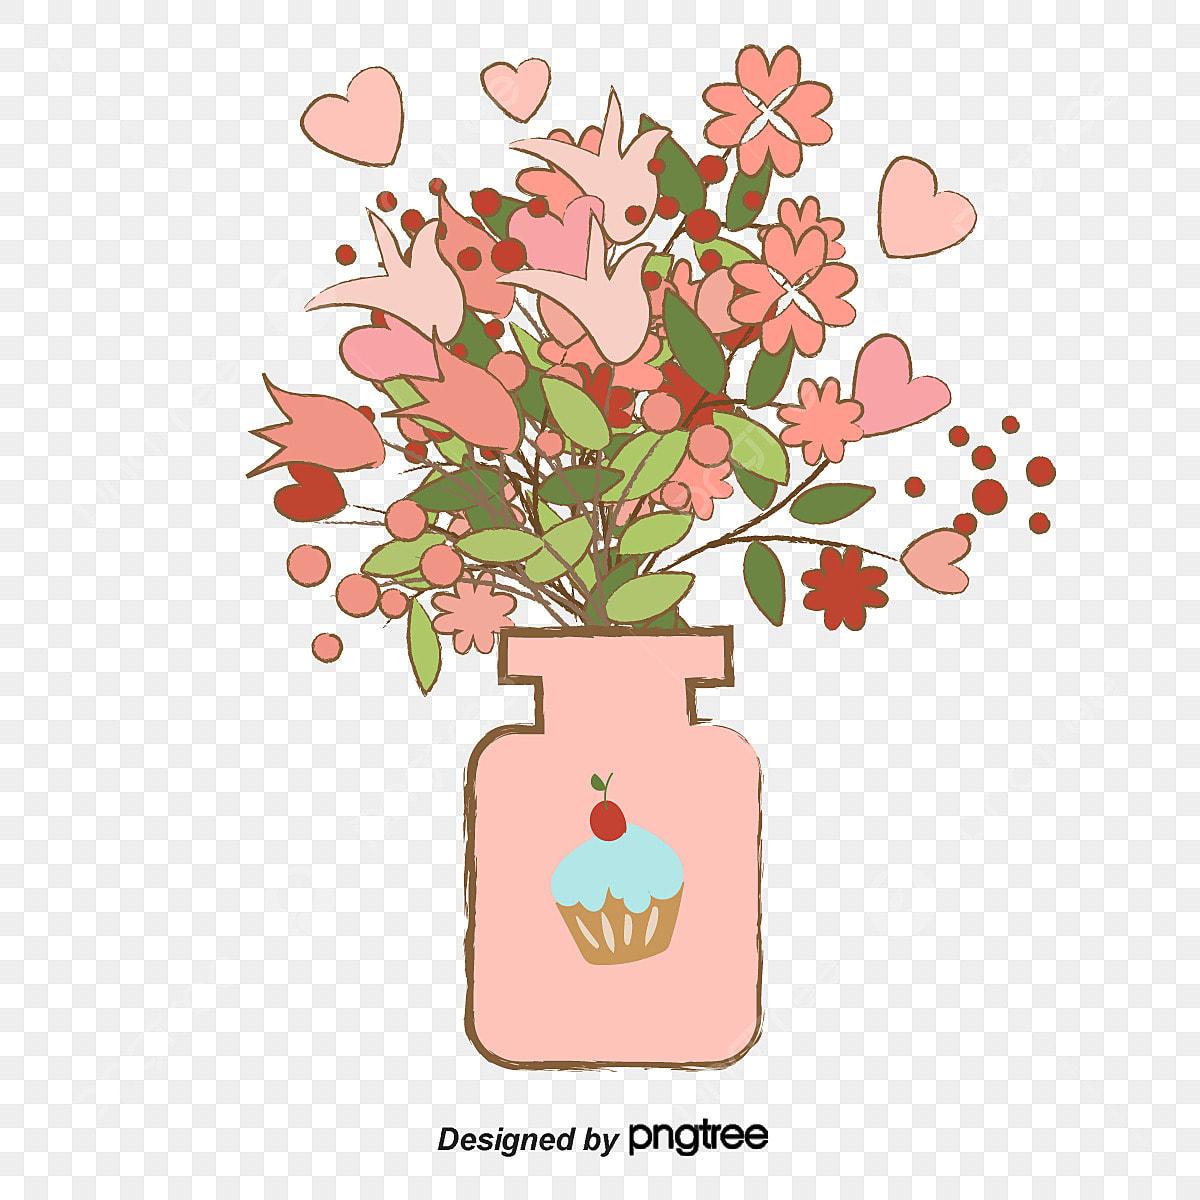 225 & Fig Flower Vase Flower Material Flower Clipart Flowers Vase PNG ...